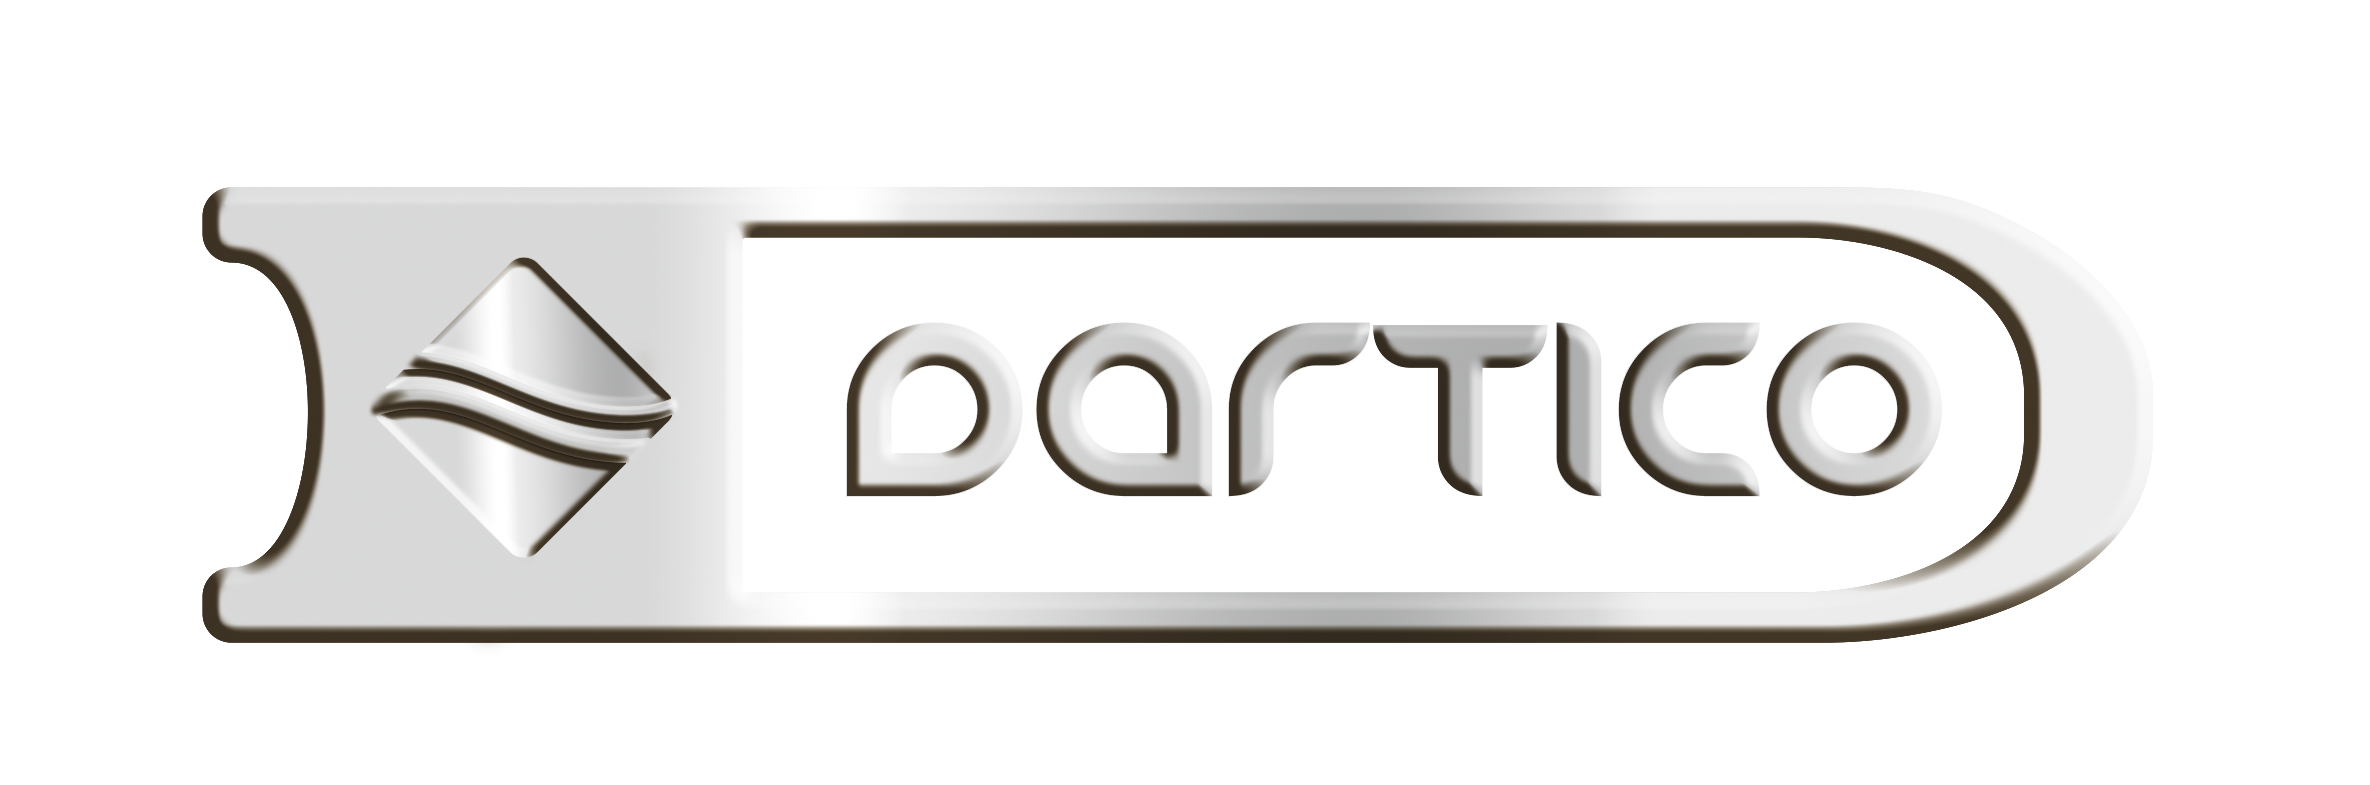 DARTICO